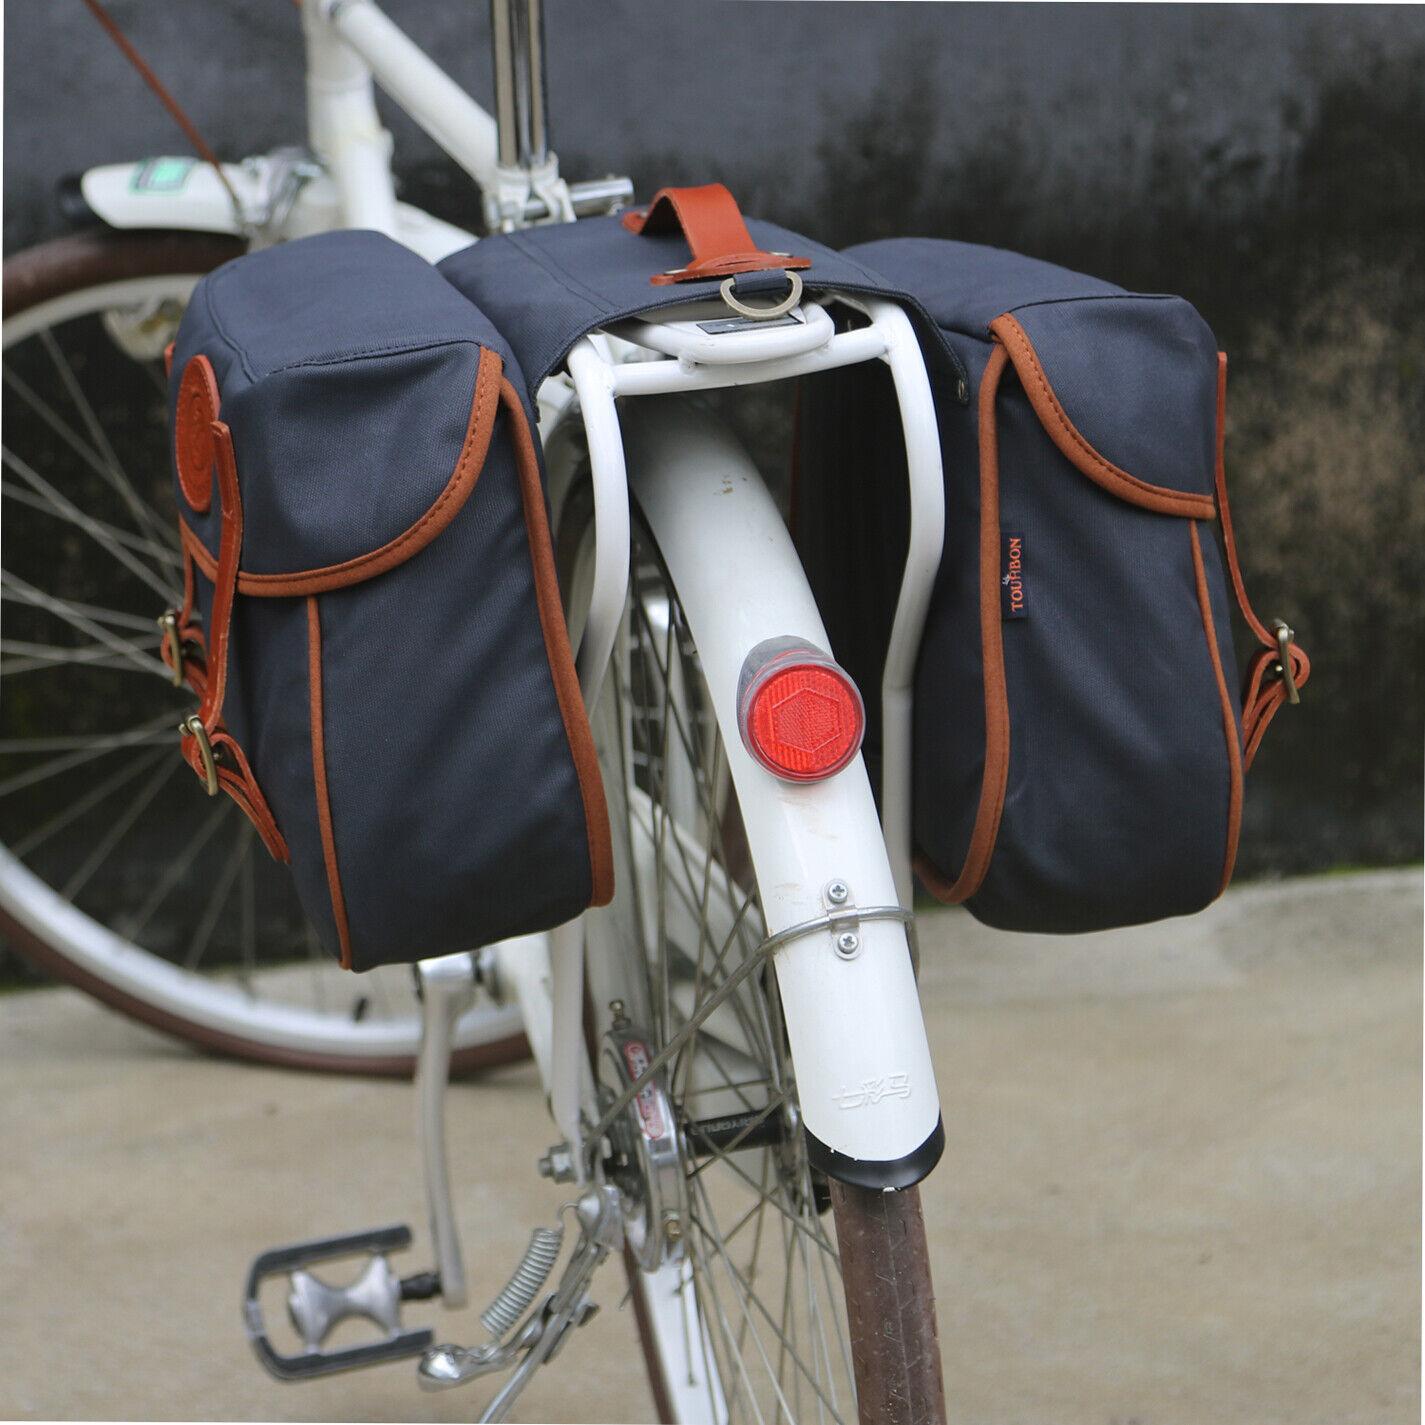 Tourbon Bike Double Pannier Cycling Trunk Bag Rack Market Bag Rollup-US Delivery